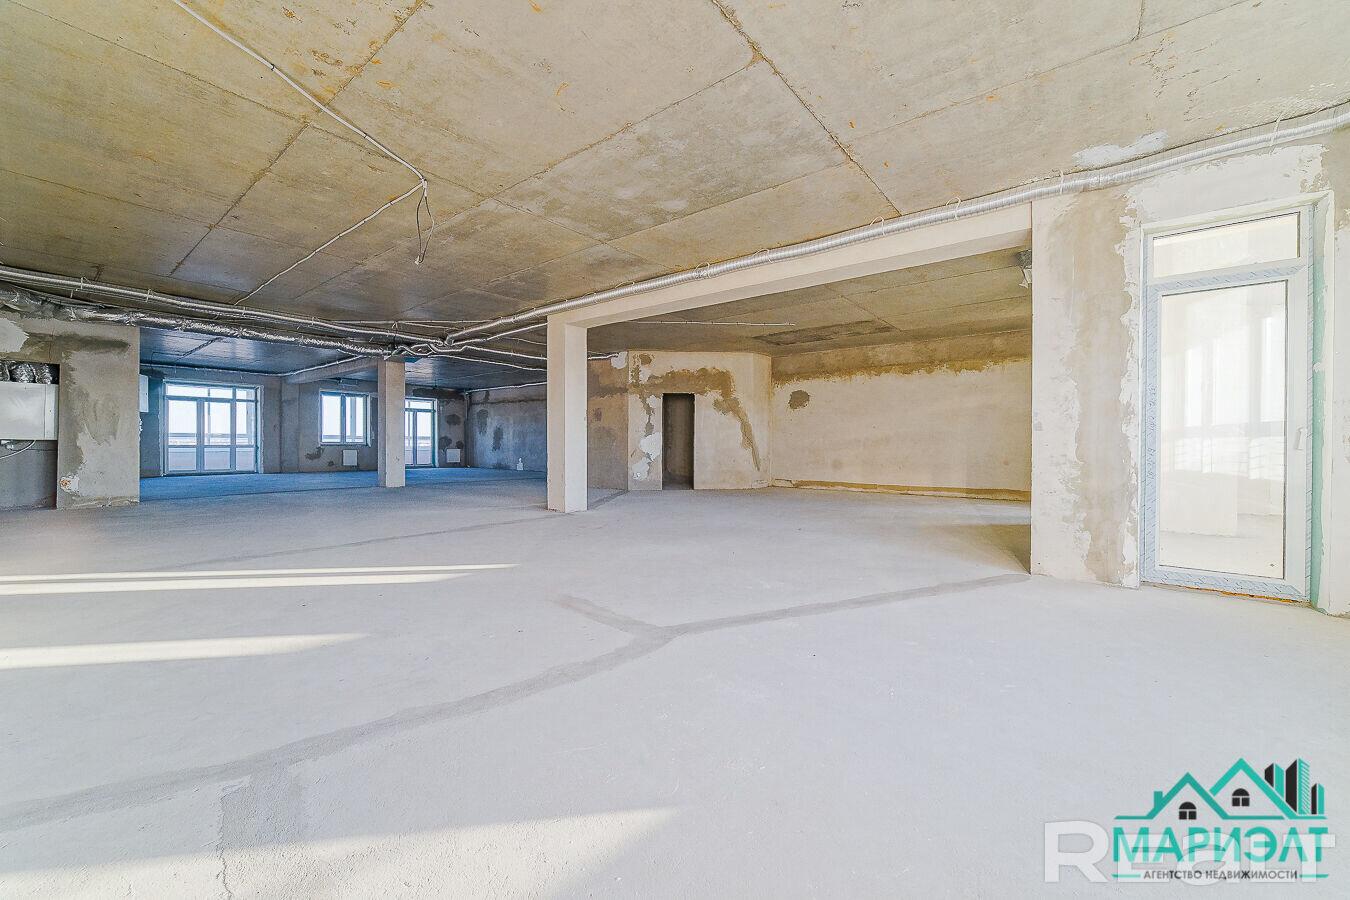 Продается 4-х комнатная квартира, ул. Сторожовская д.6 - фото №15